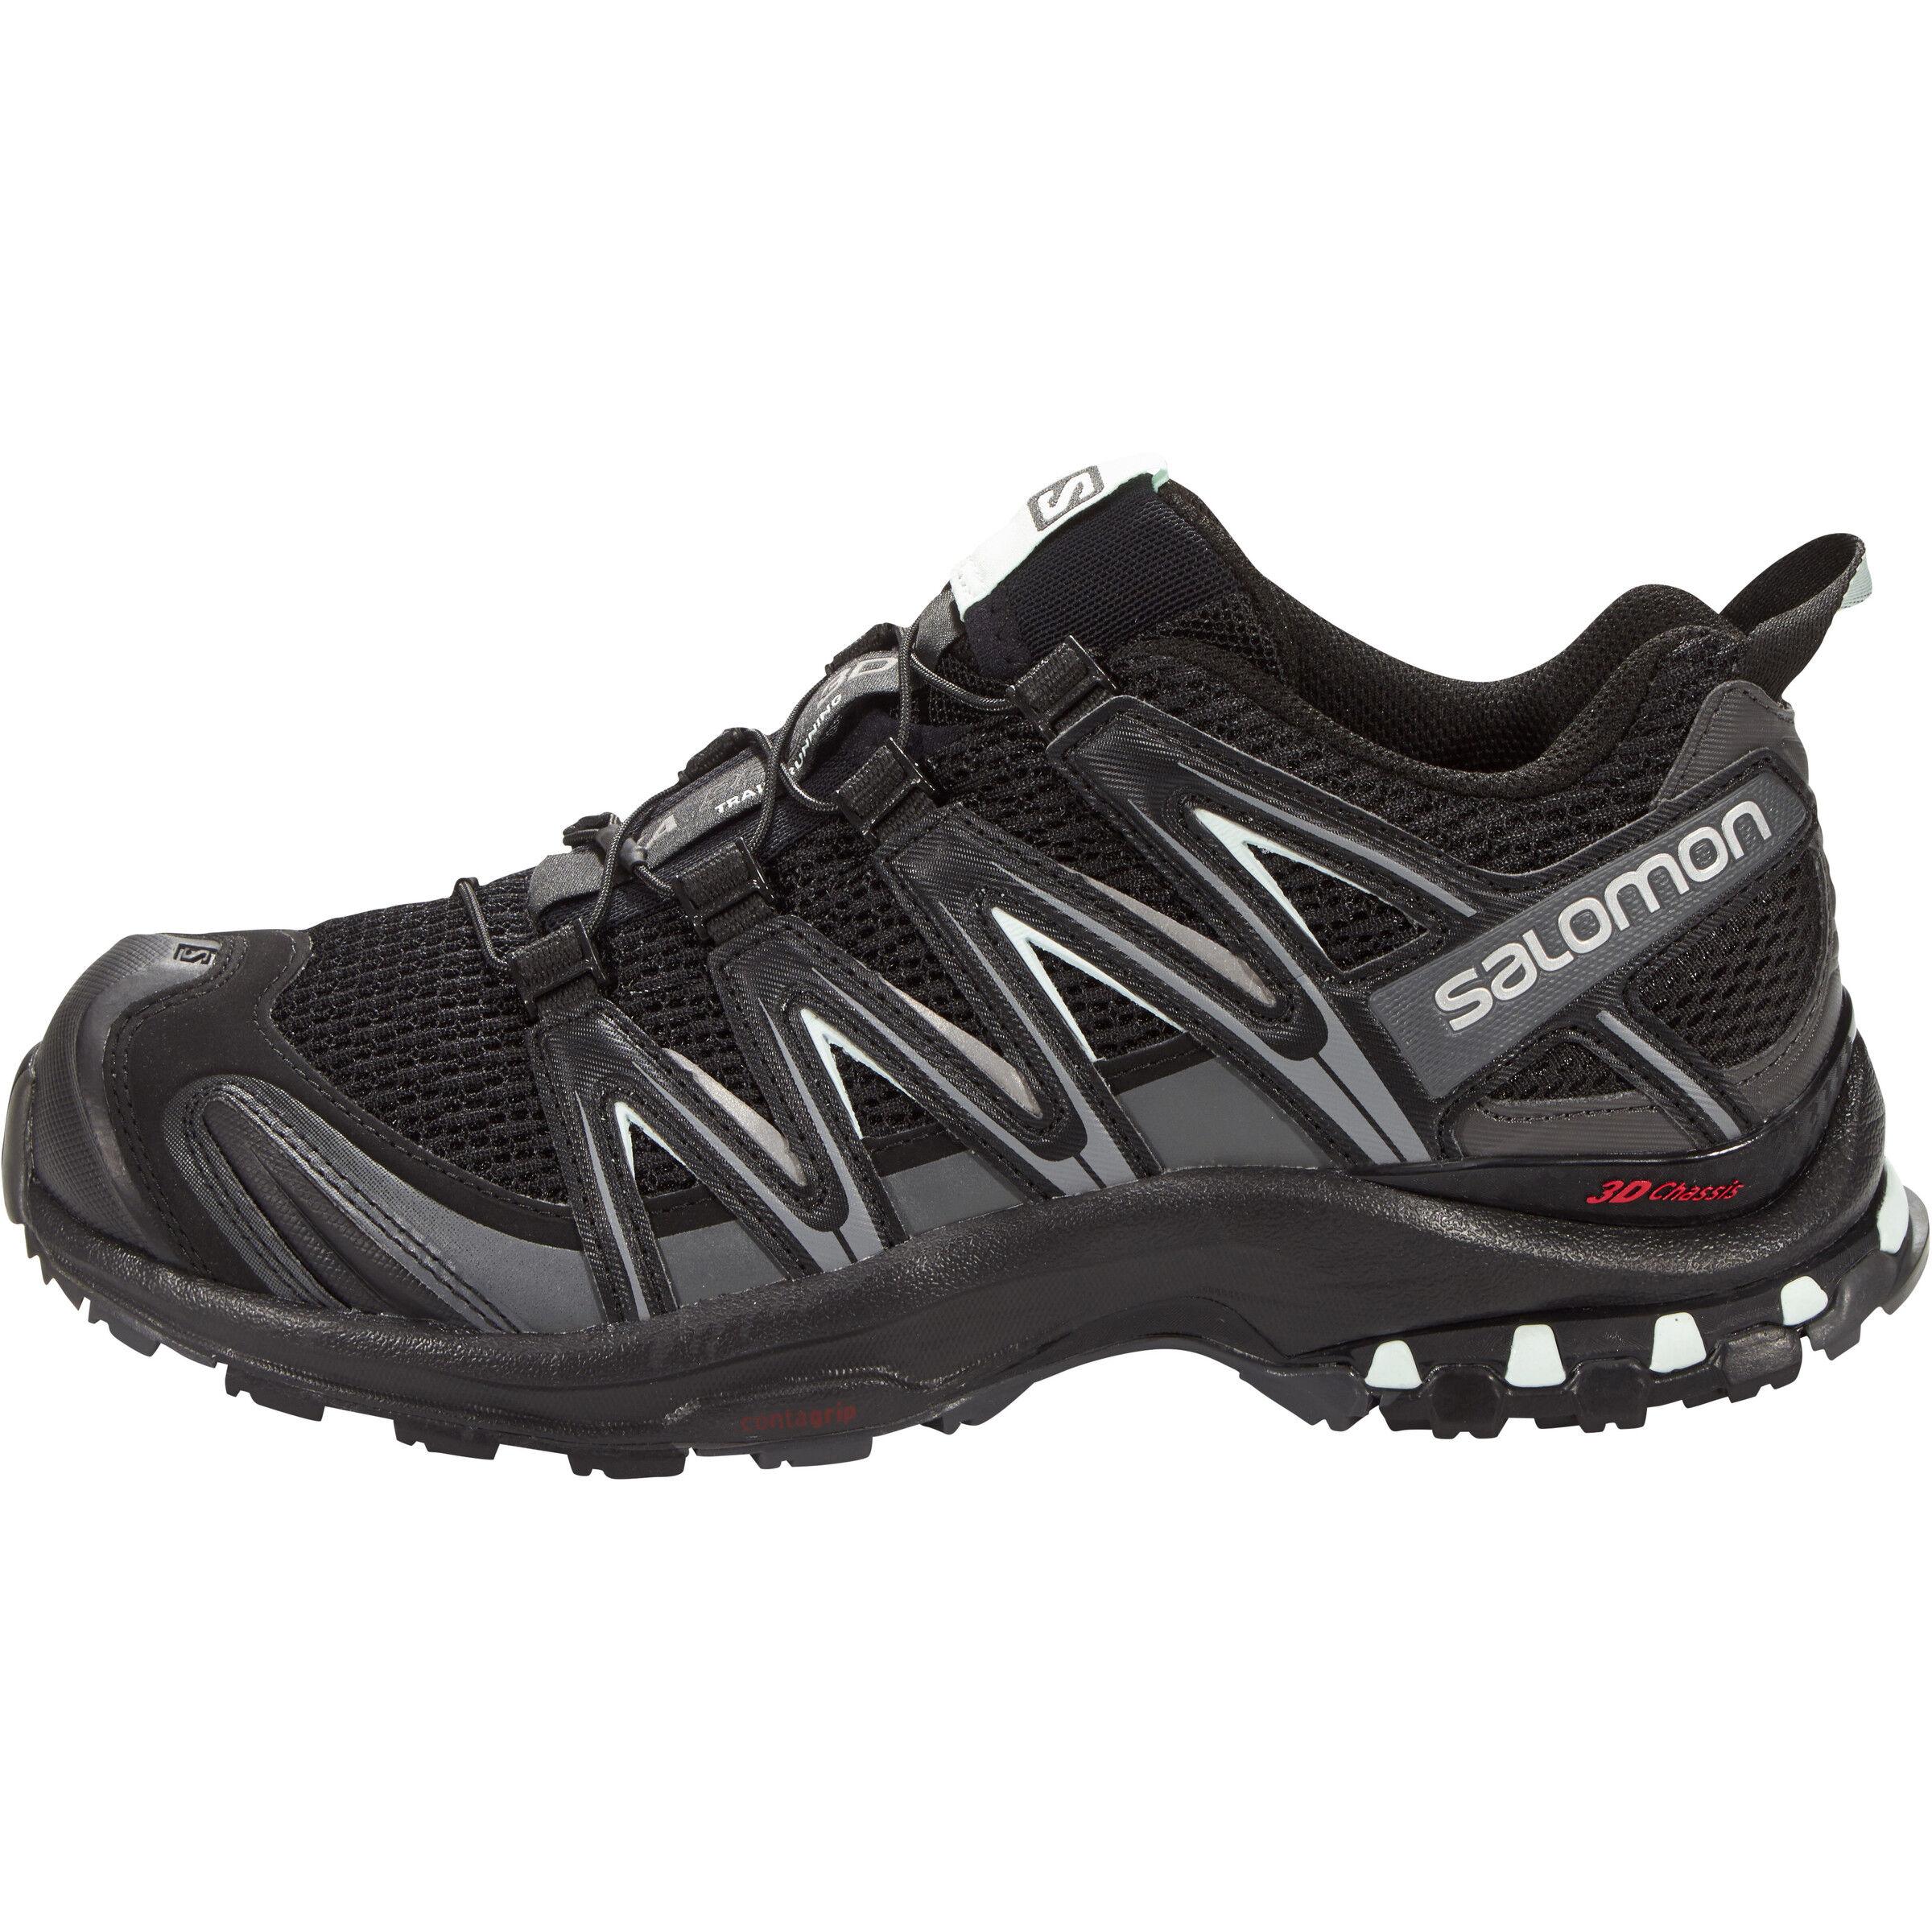 Salomon XA Pro 3D Shoes Damen blackmagnetfair aqua